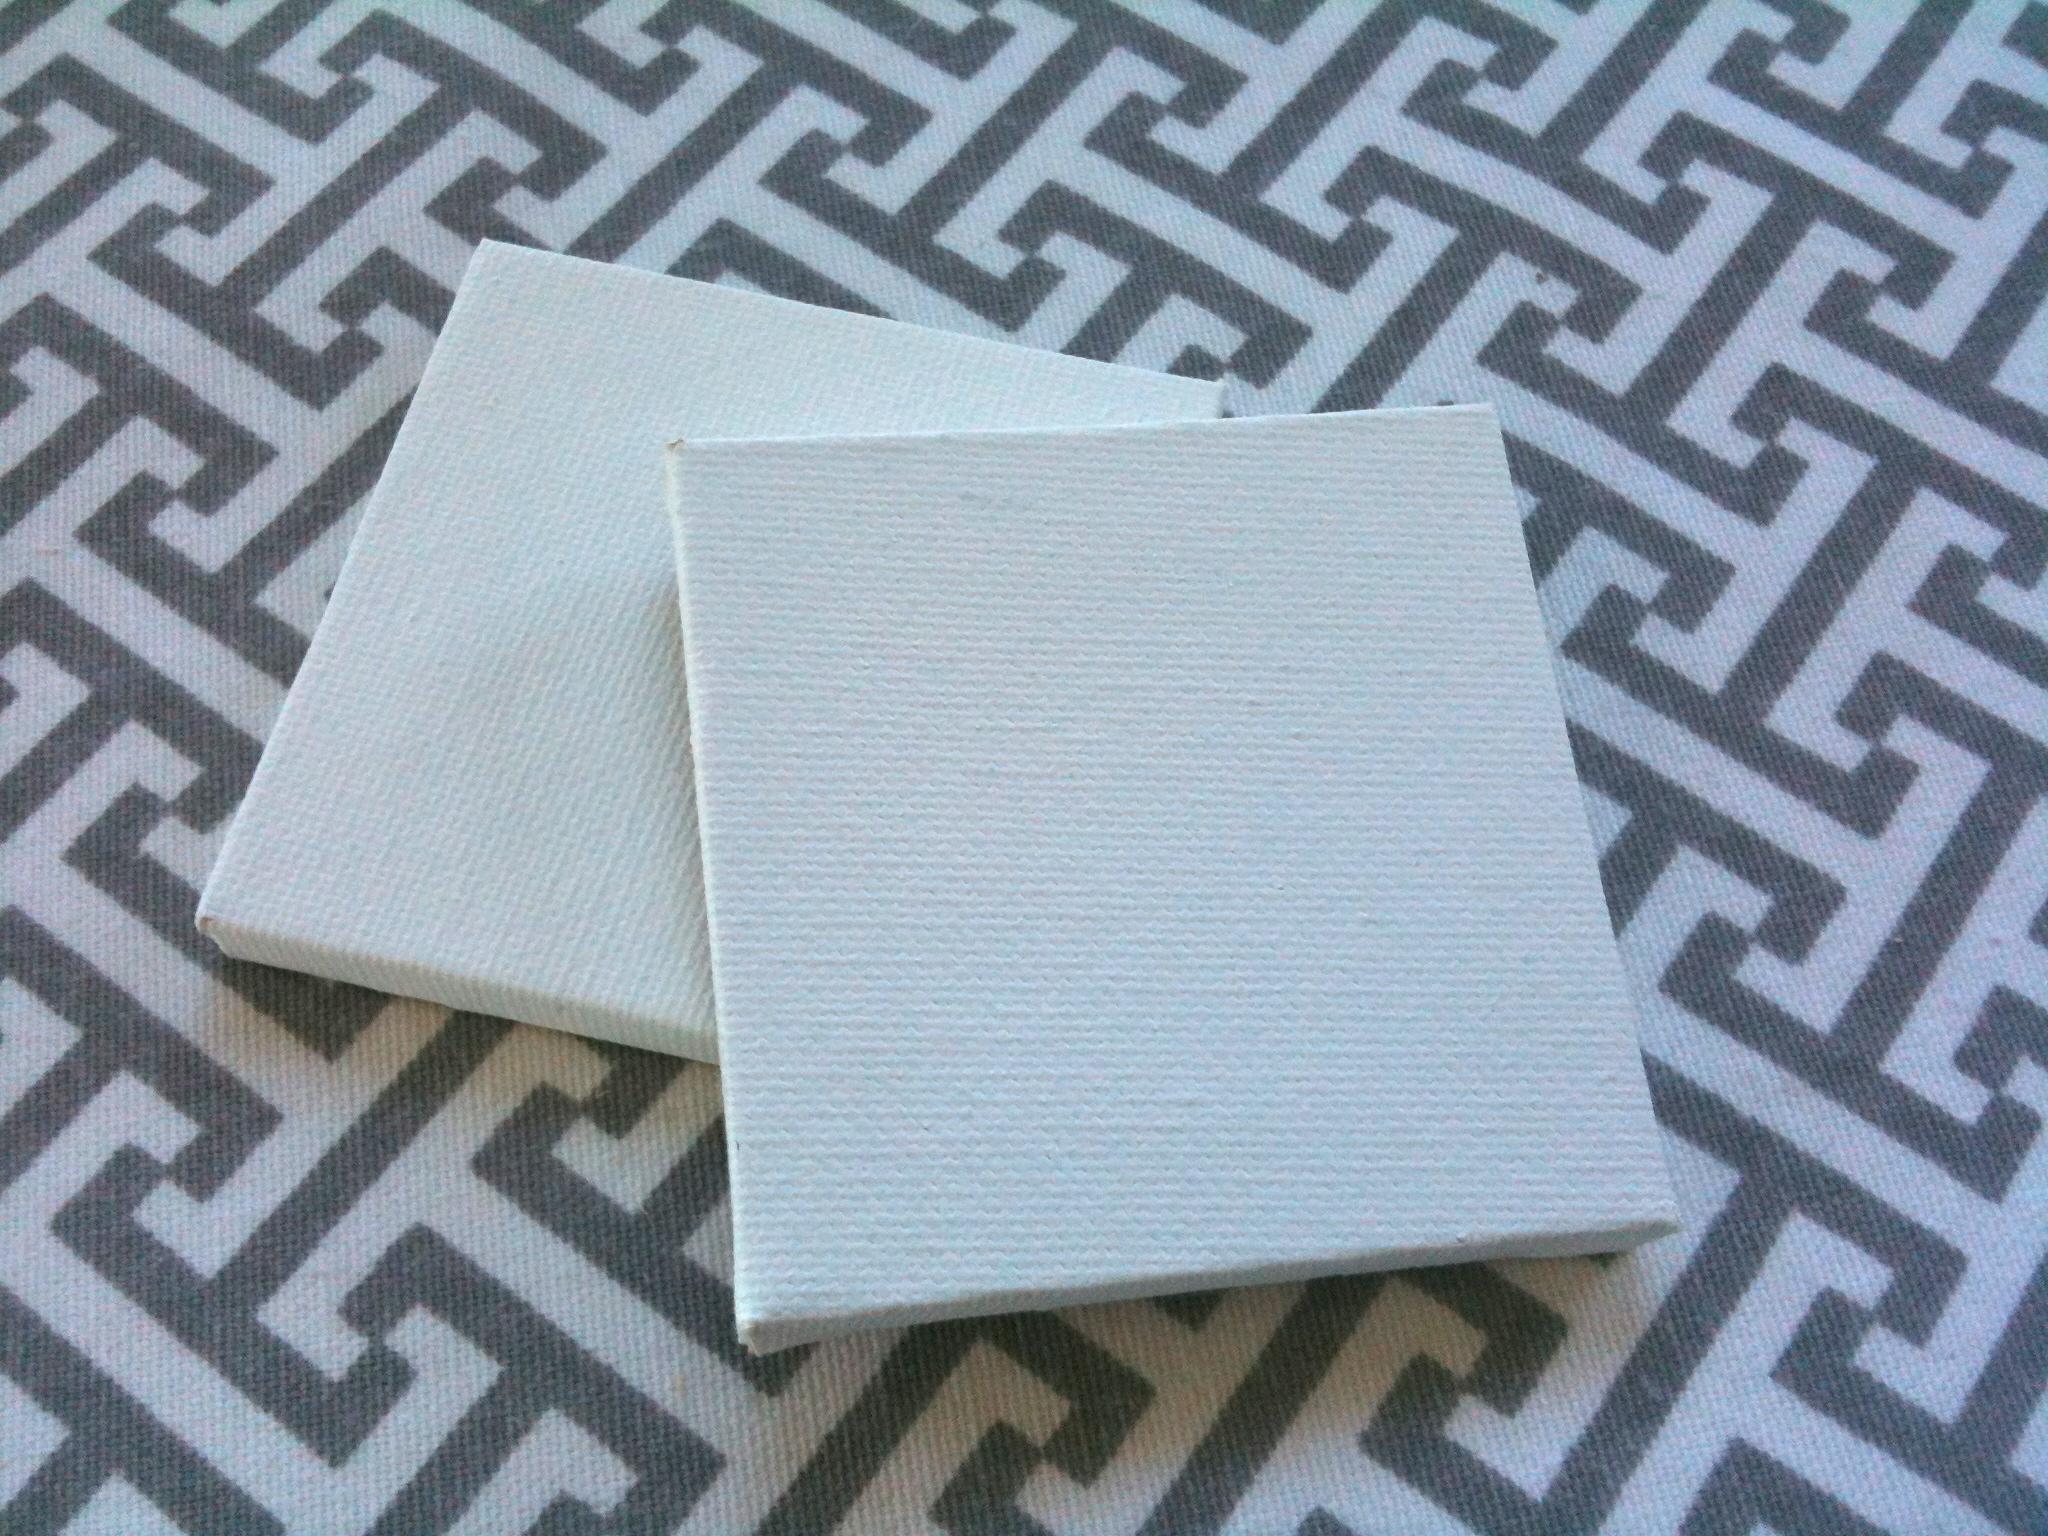 Diy mini artist canvas magnets rad design